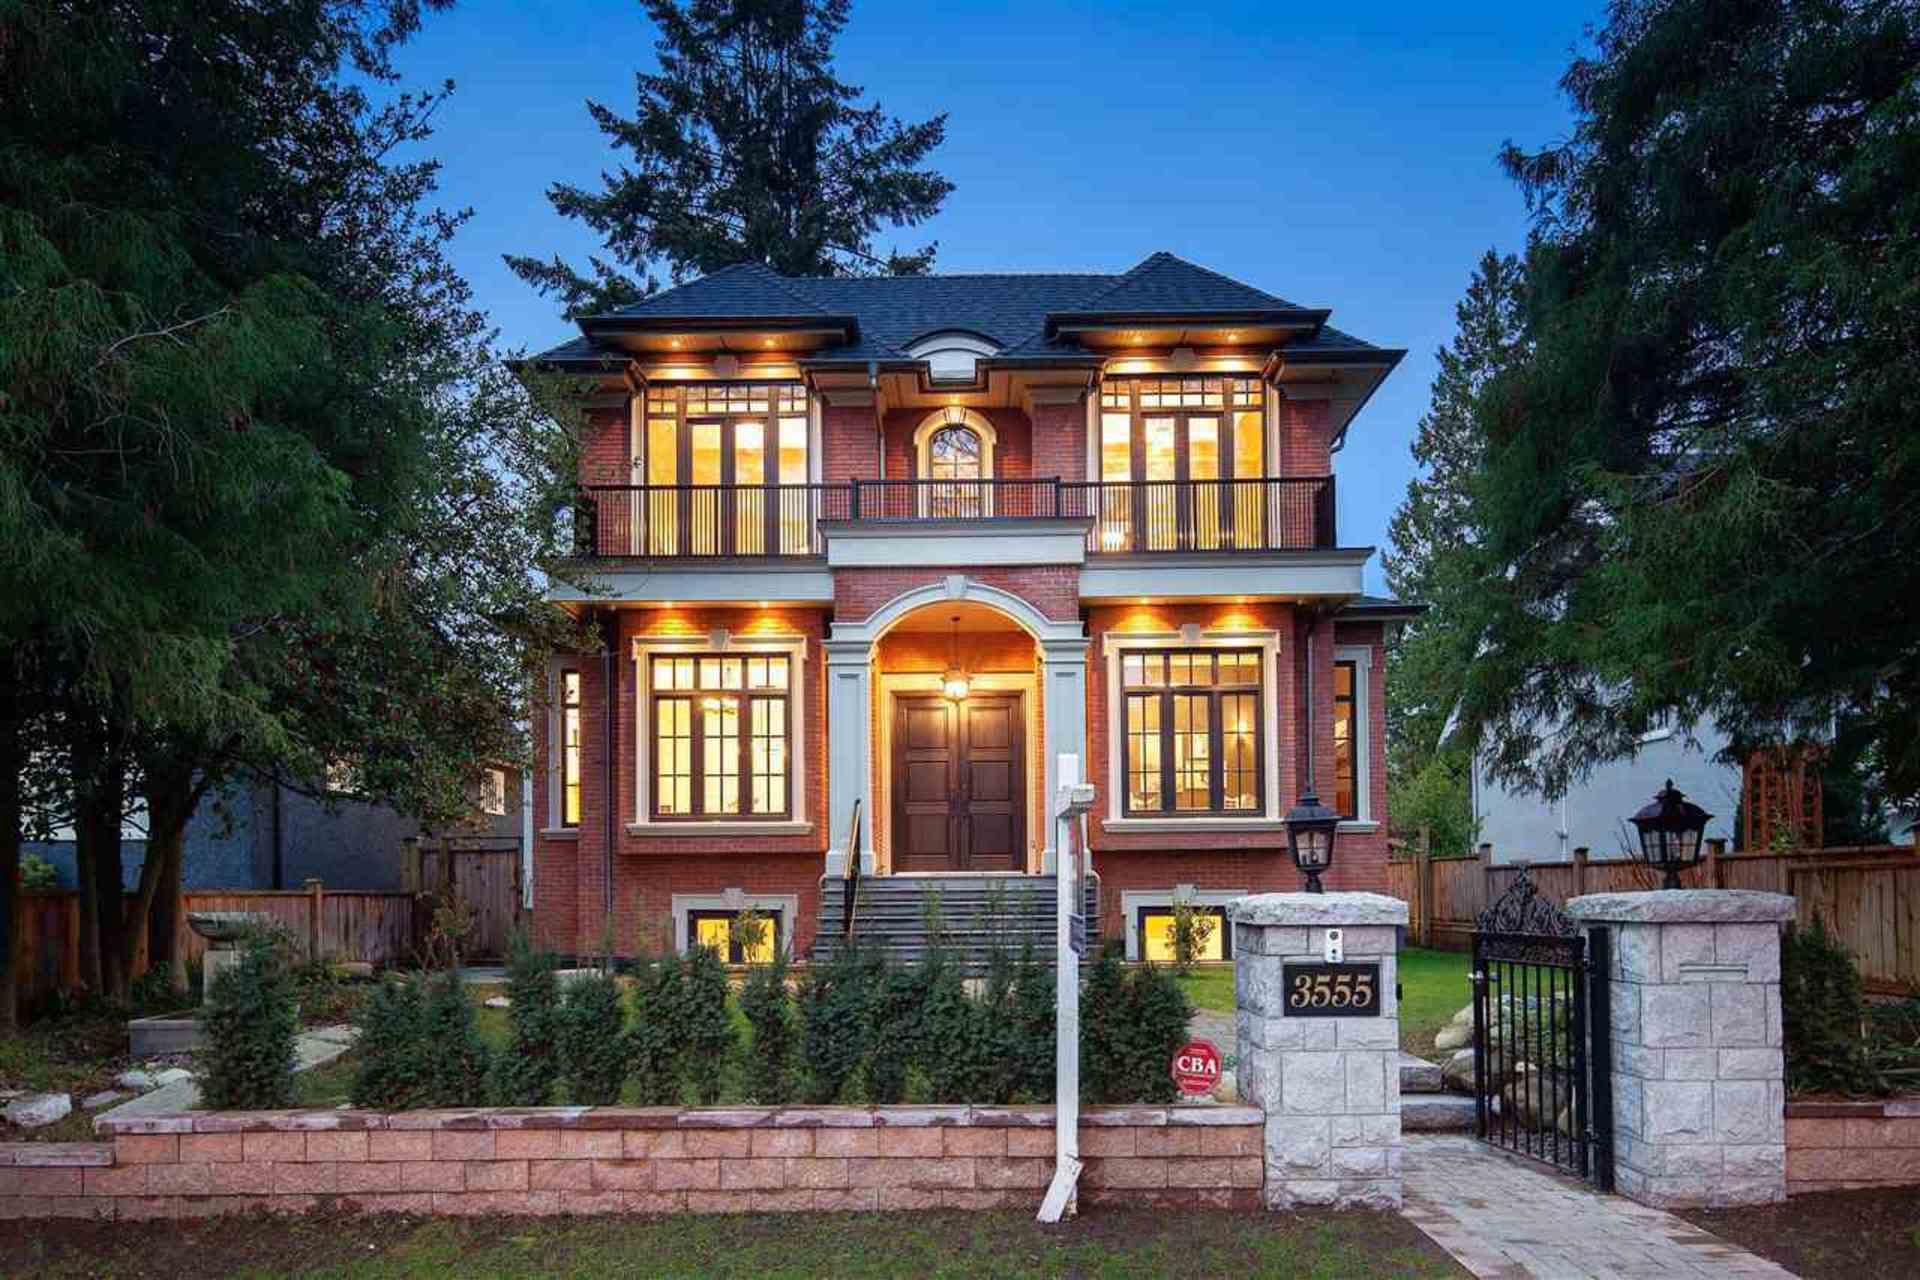 3555-w-28th-avenue-dunbar-vancouver-west-01 at 3555 W 28th Avenue, Dunbar, Vancouver West